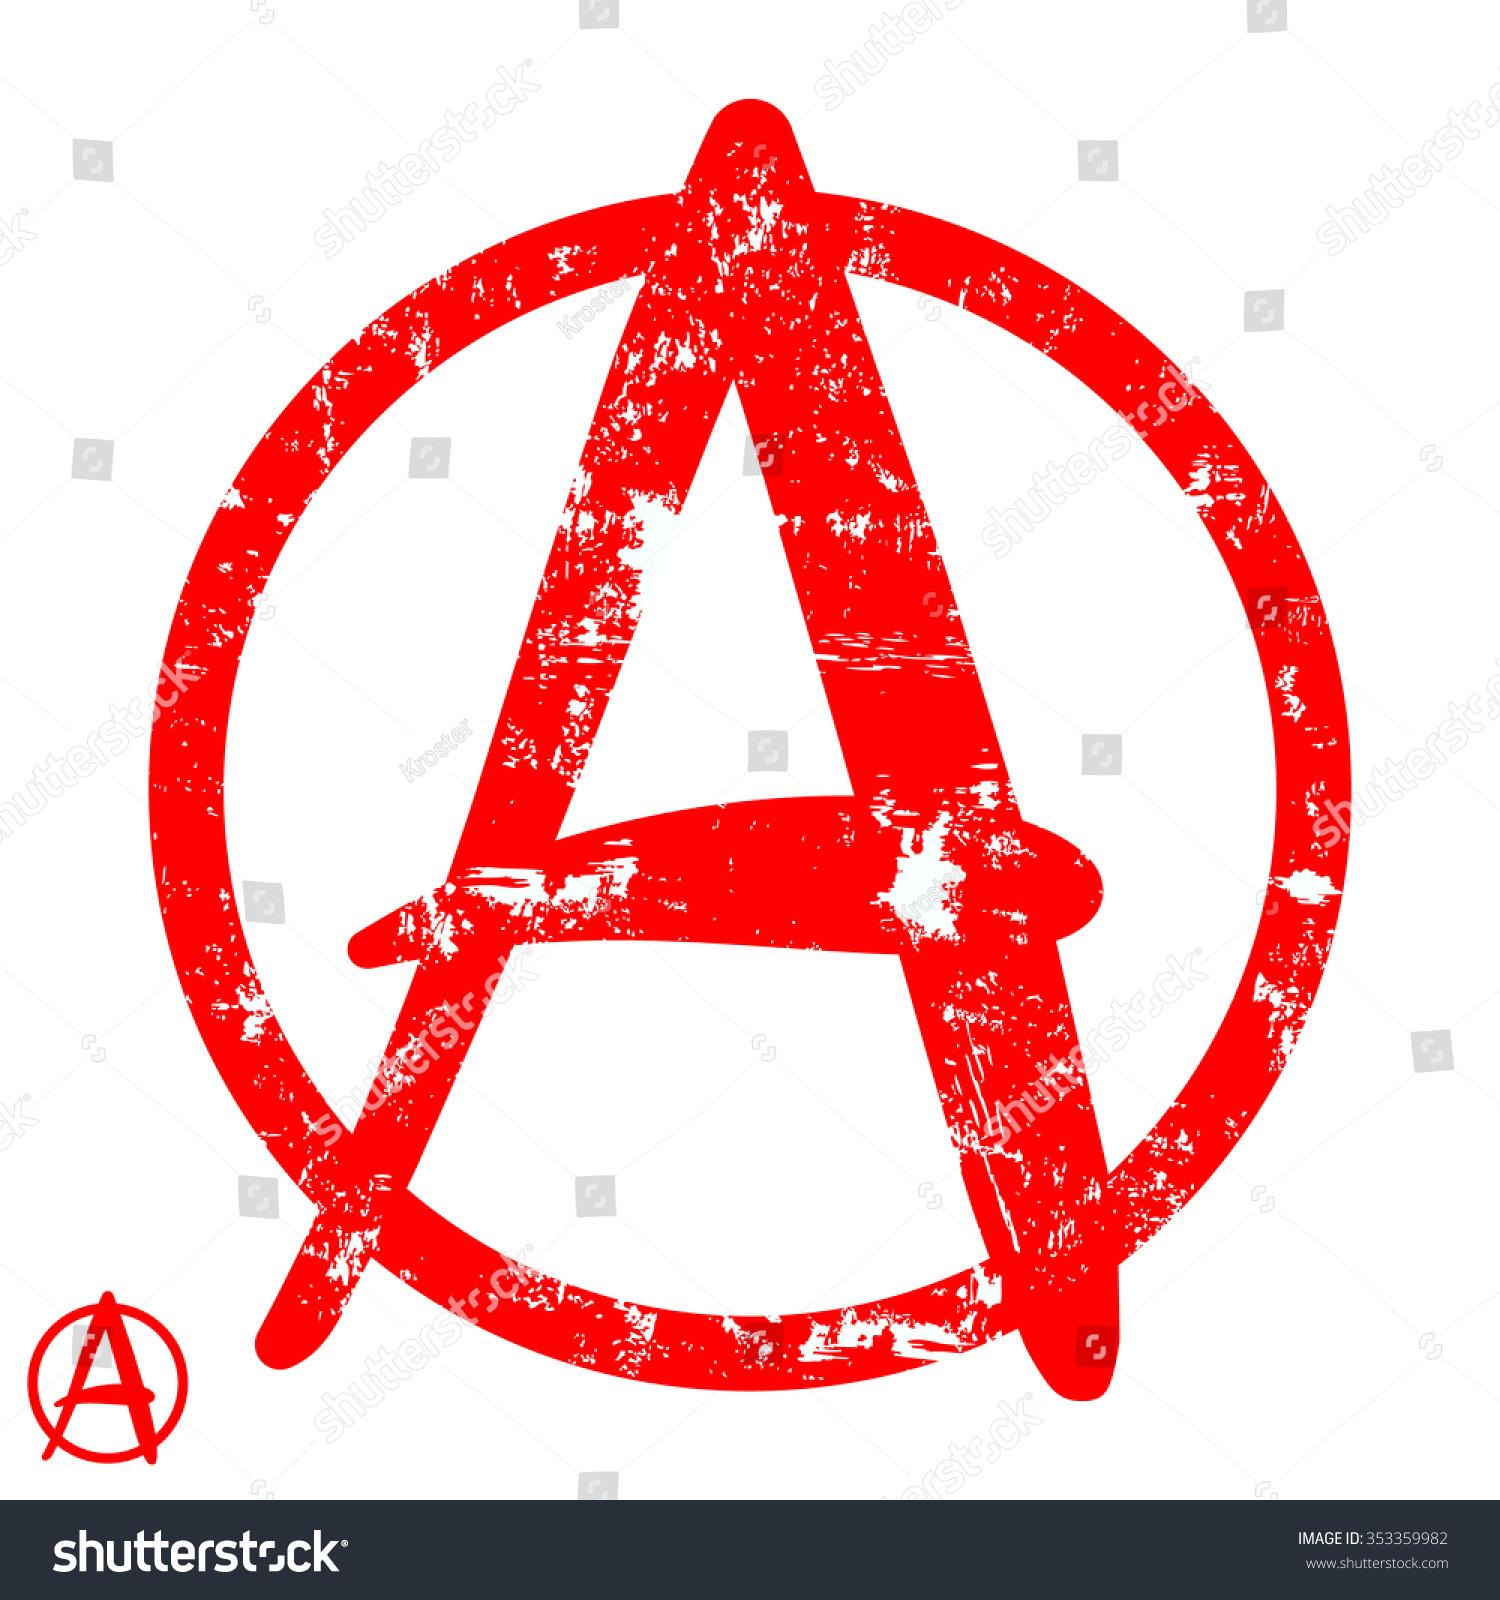 Anarchy symbolvector illustration stock vector 353359982 anarchy symbolctor illustration buycottarizona